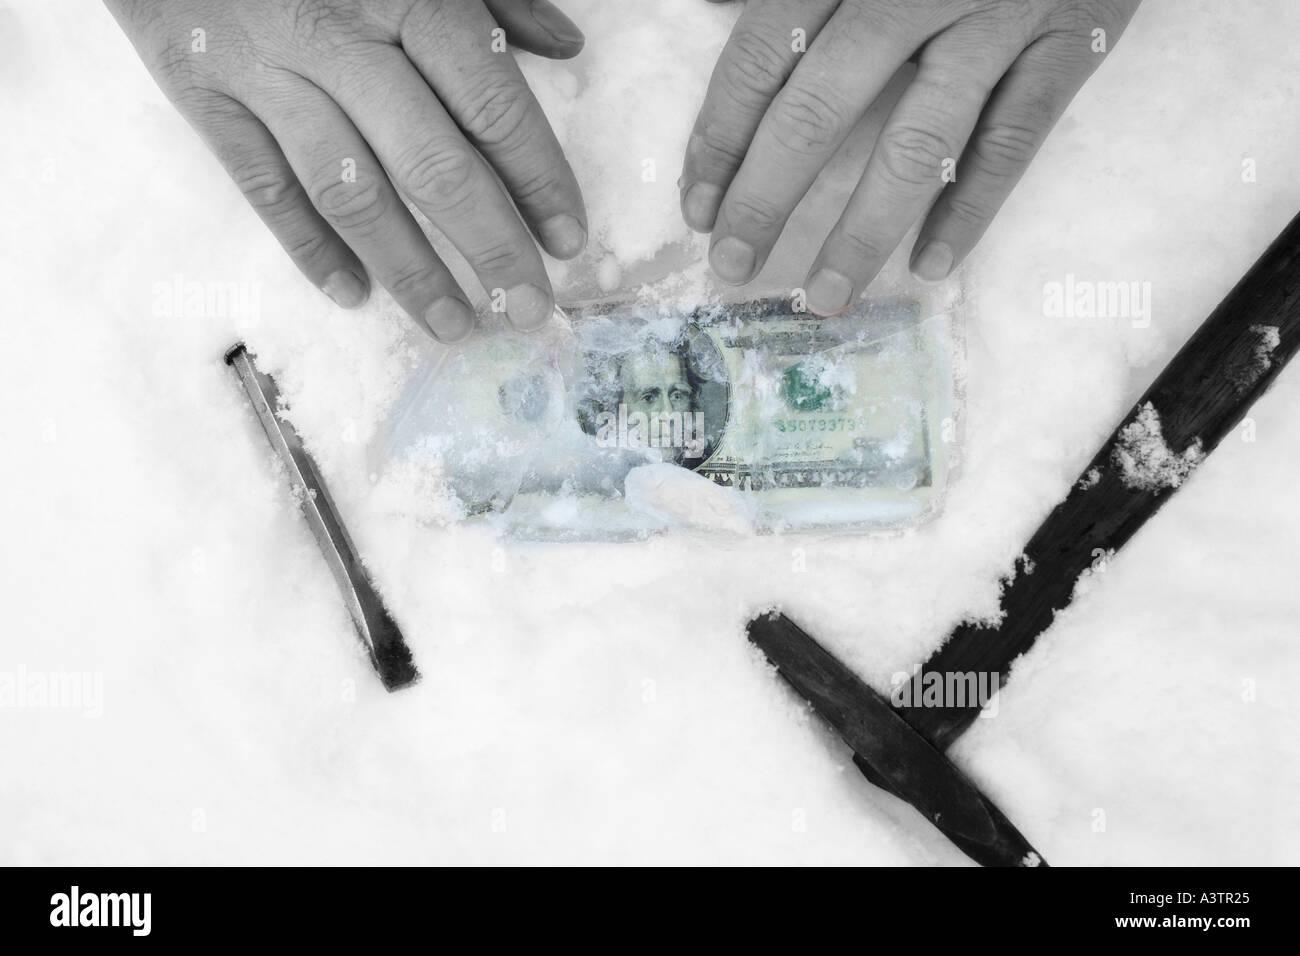 Twenty Dollar Bill US Dollars in Ice Frozen Assets money concept - Stock Image